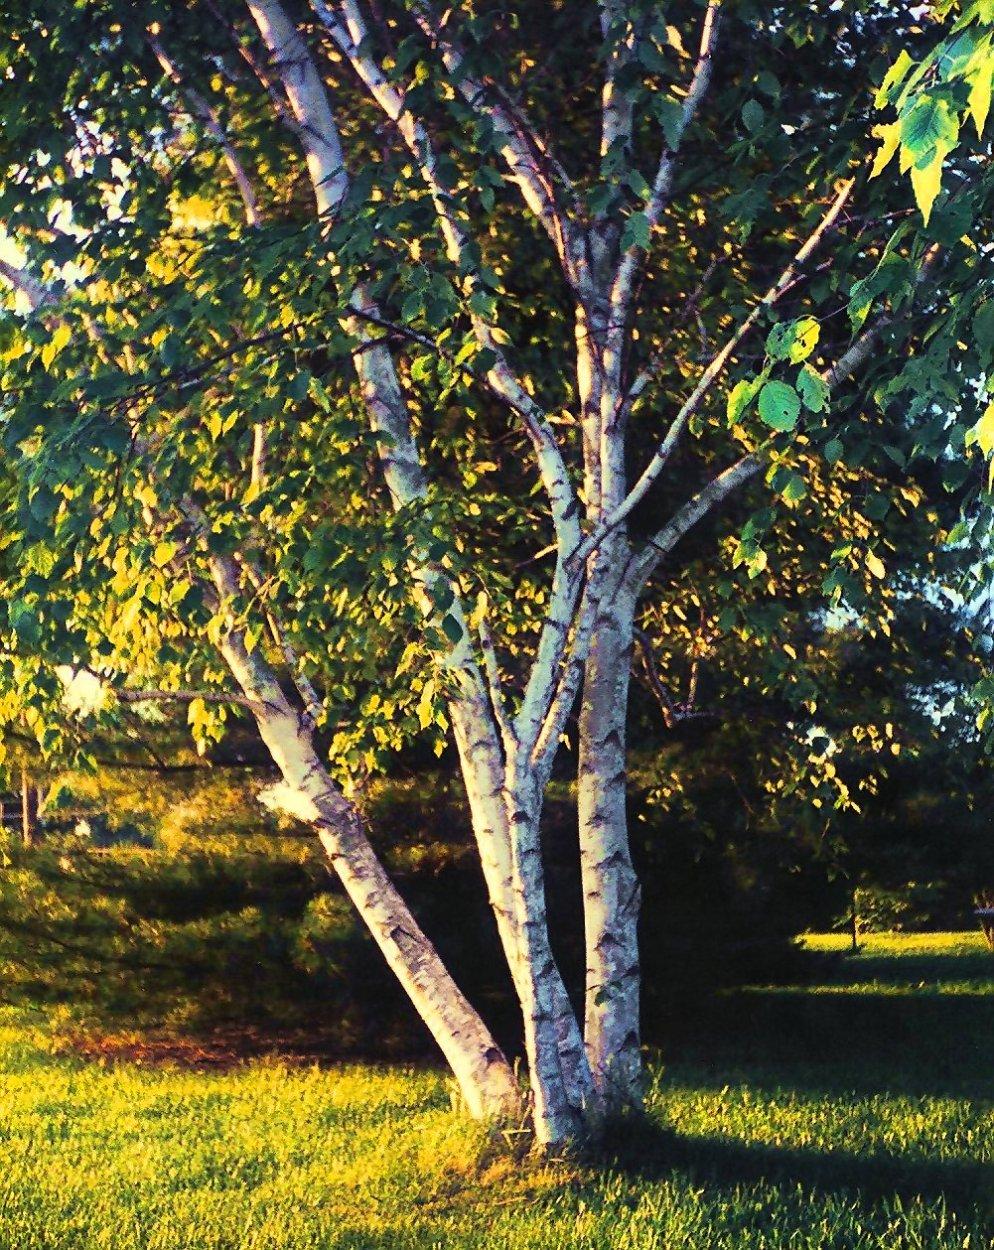 birch-tree-my-backyard